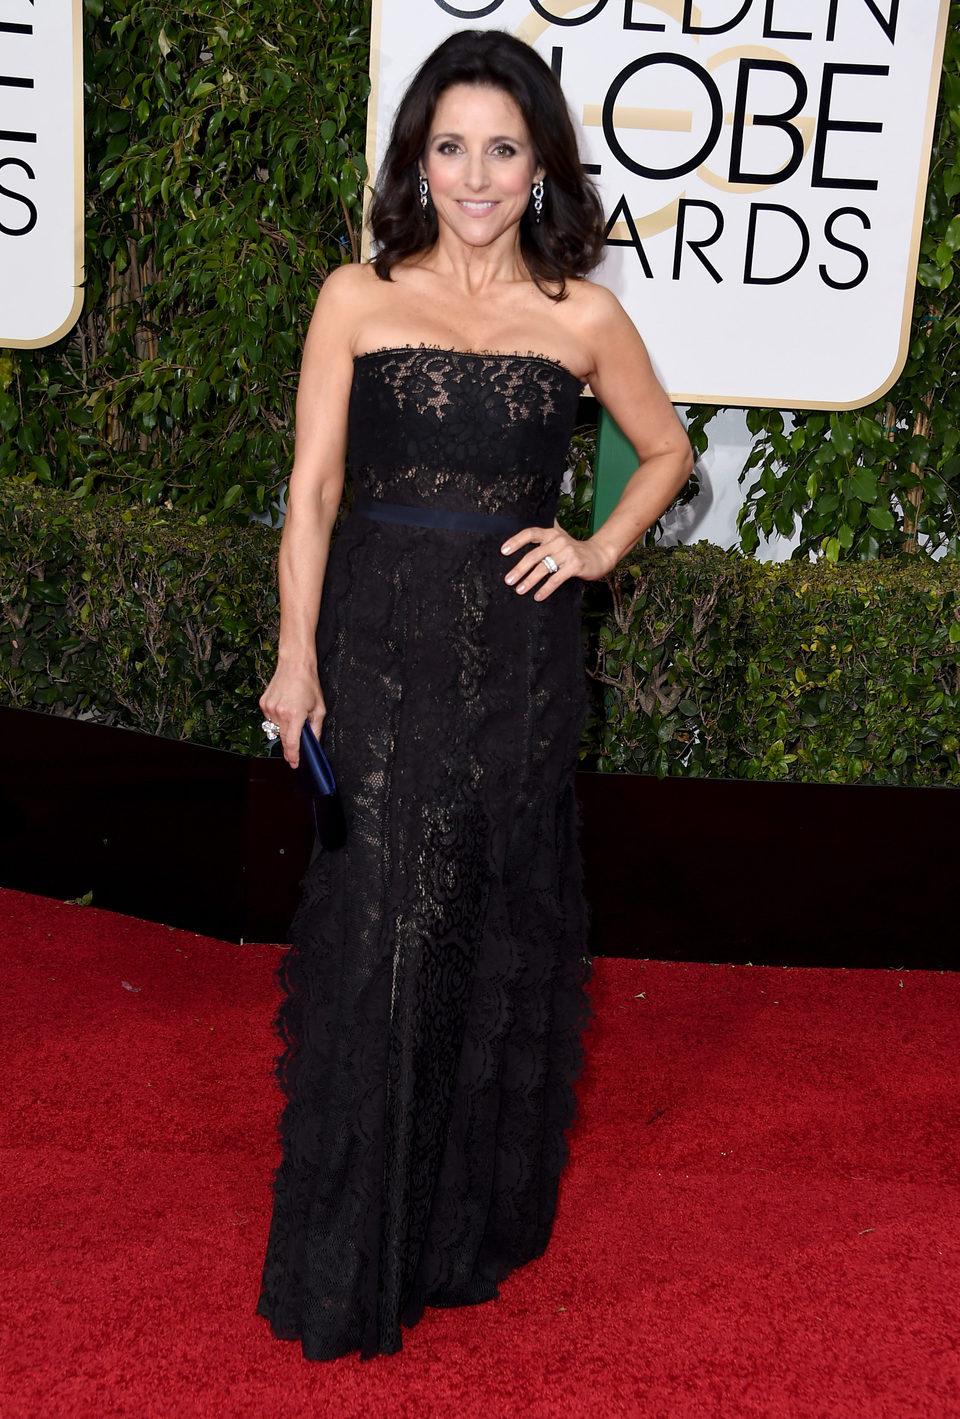 Julia Louis-Dreyfus in the 2016 Golden Globes red carpet